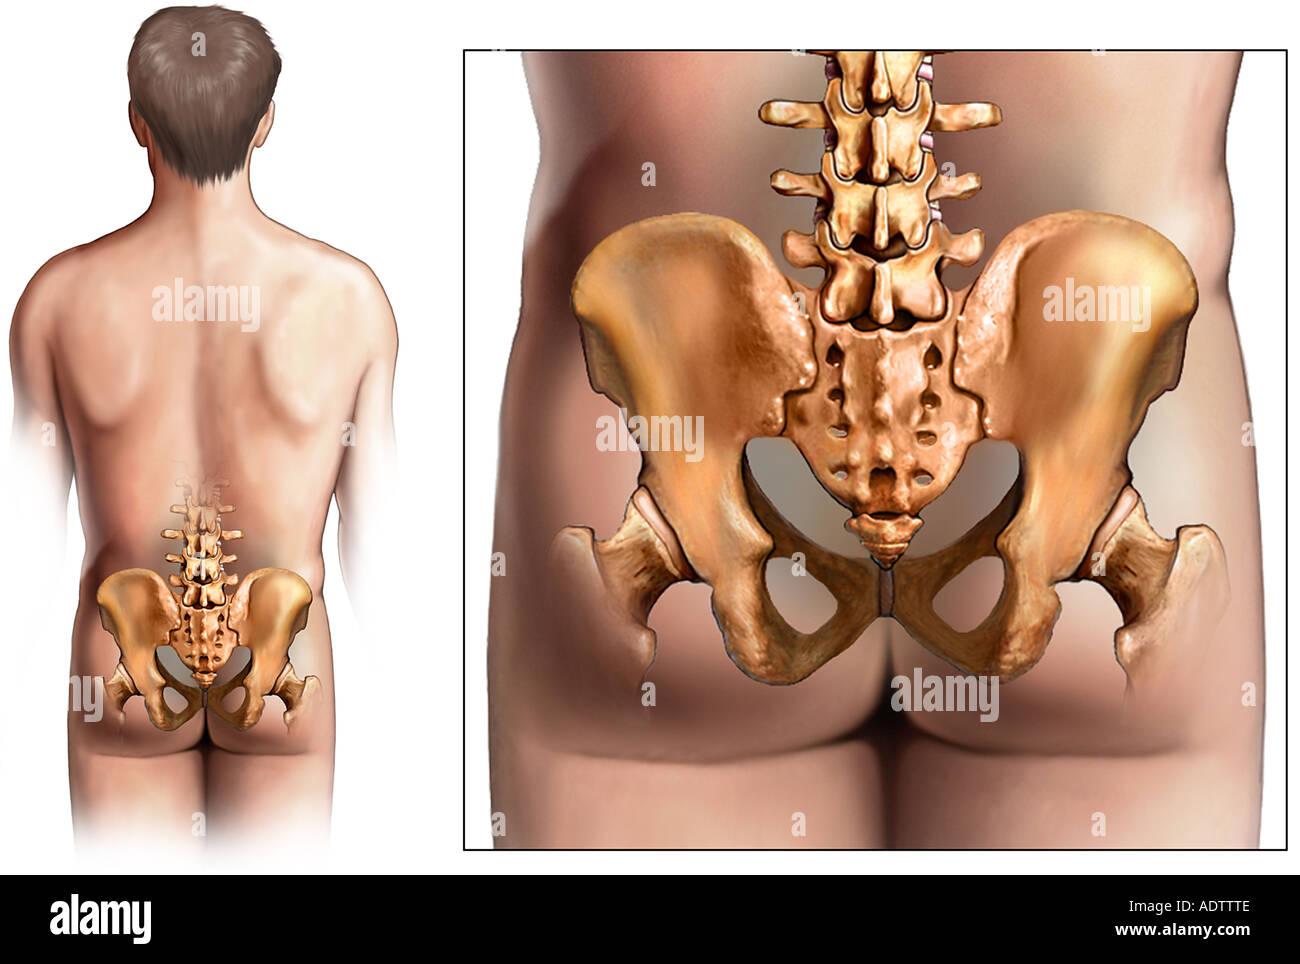 anatomy of hip choice image - learn human anatomy image, Skeleton